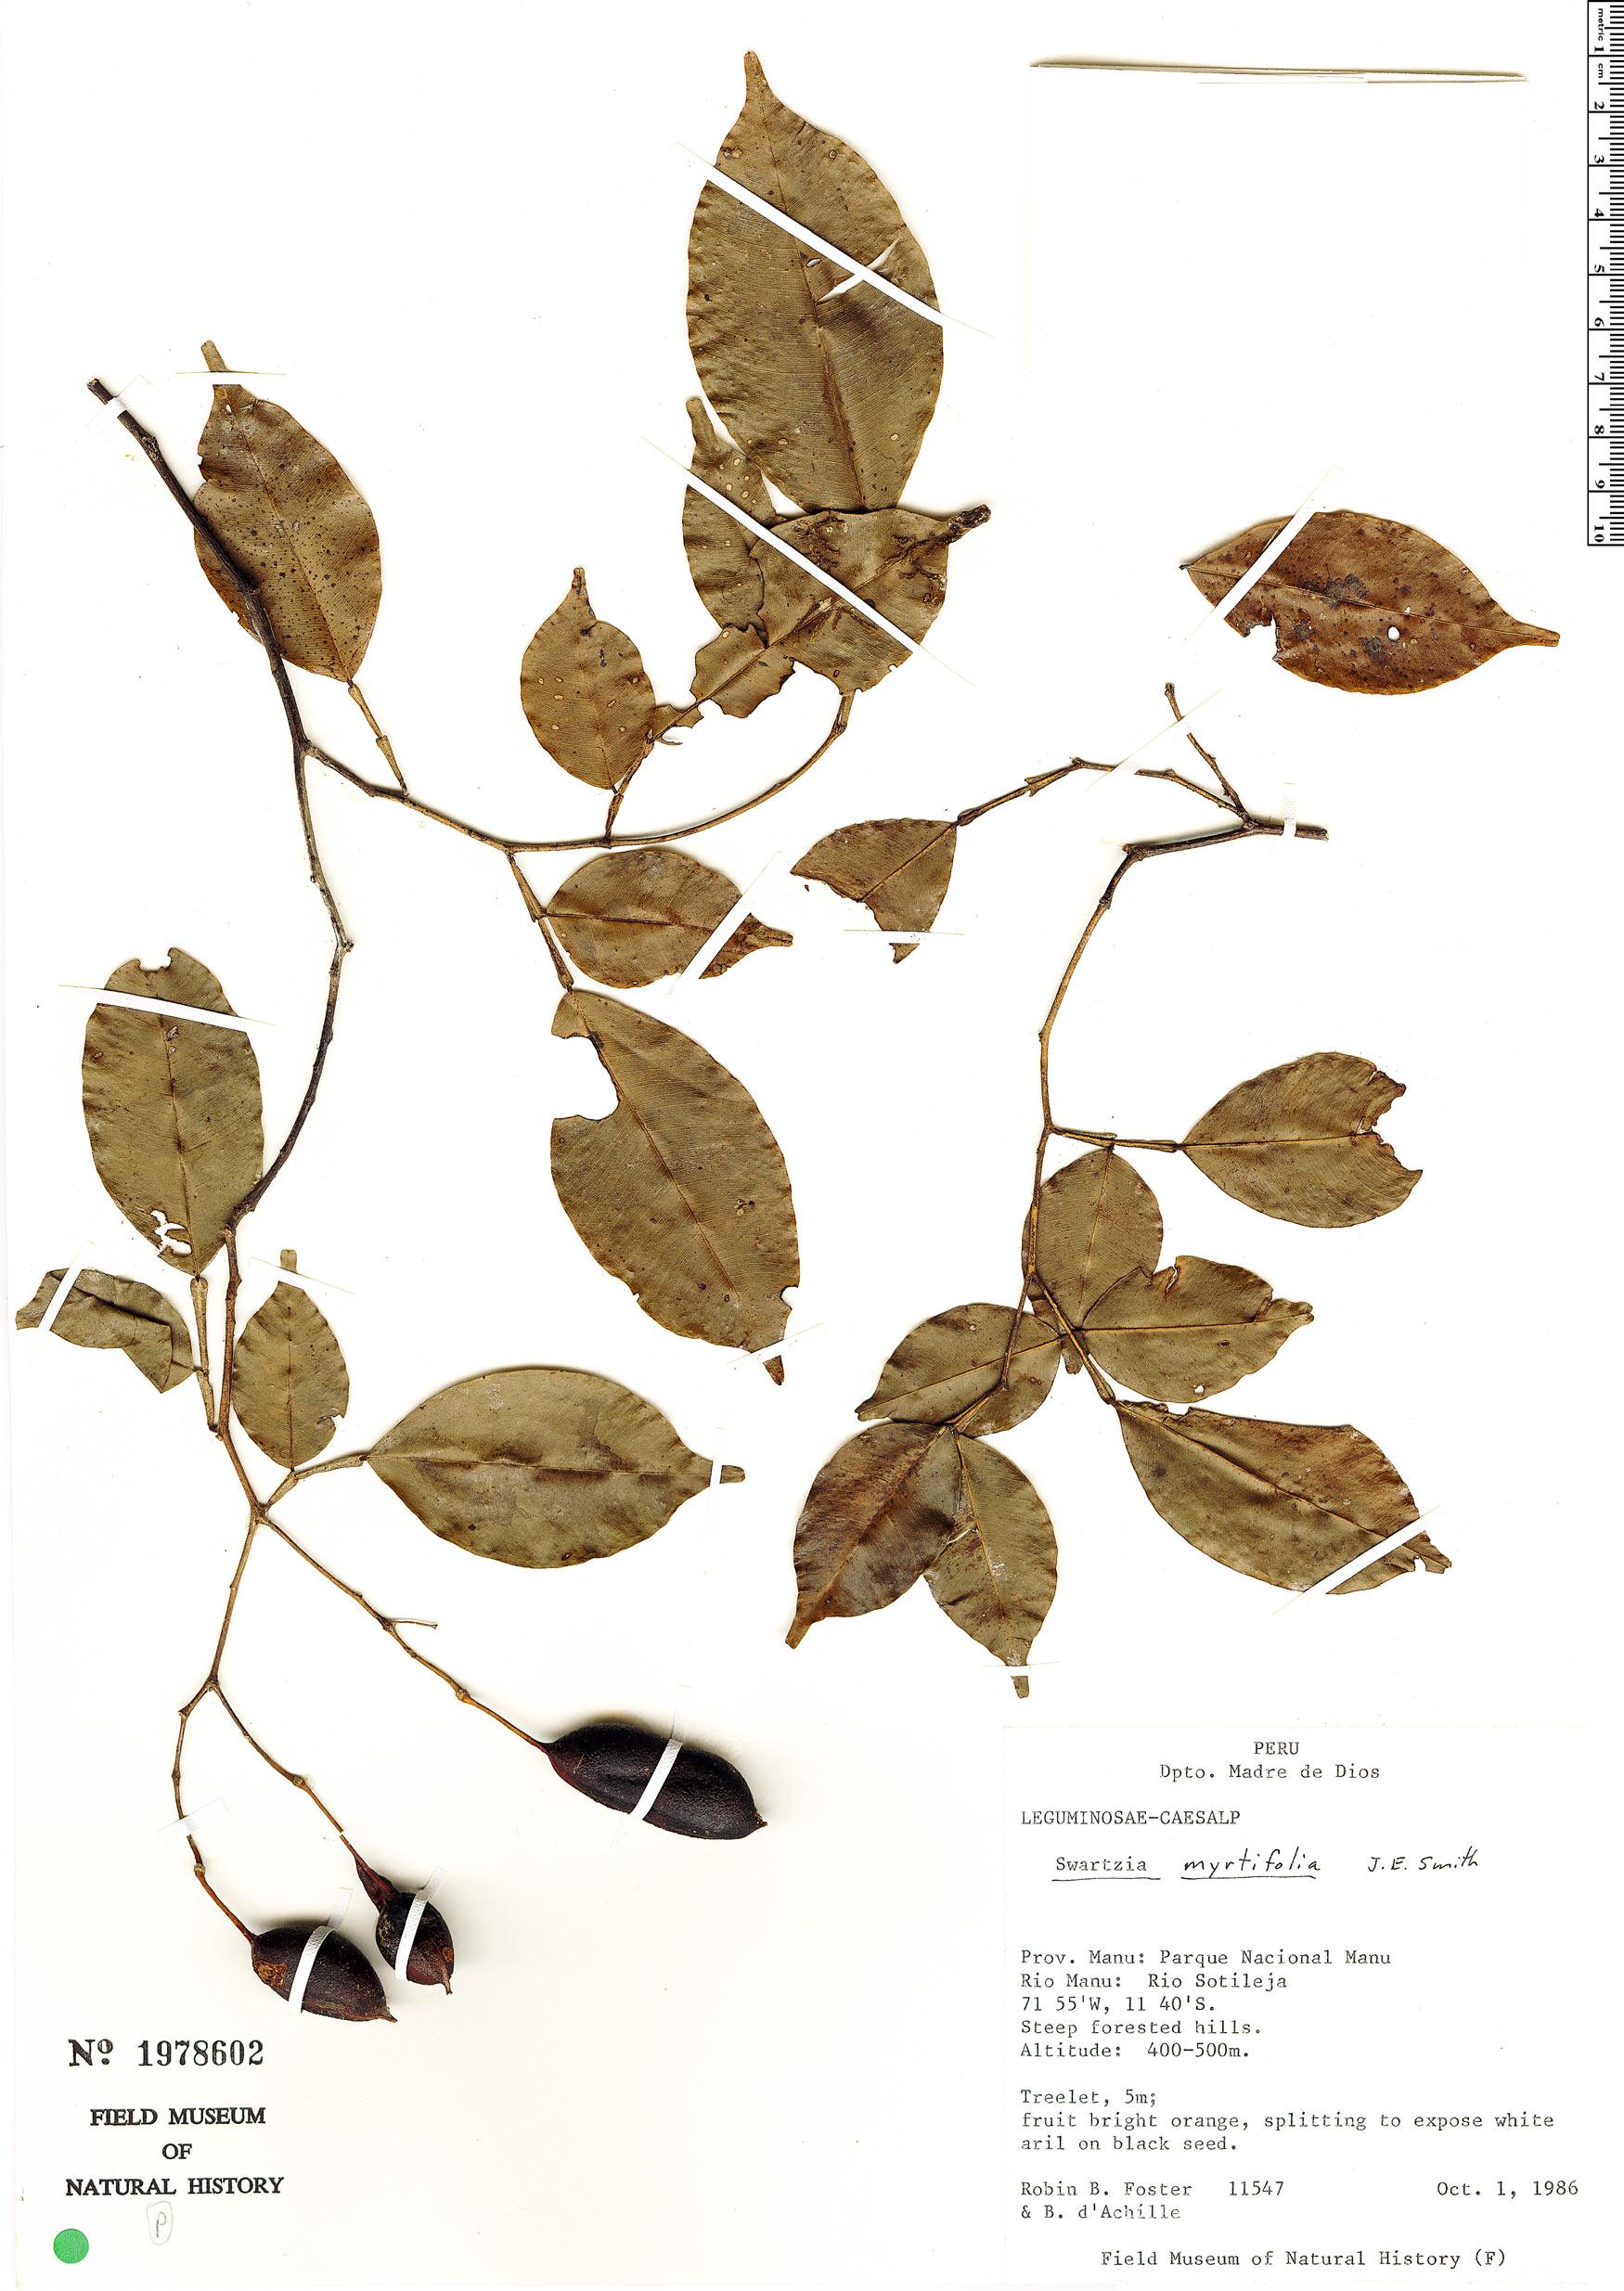 Specimen: Swartzia myrtifolia